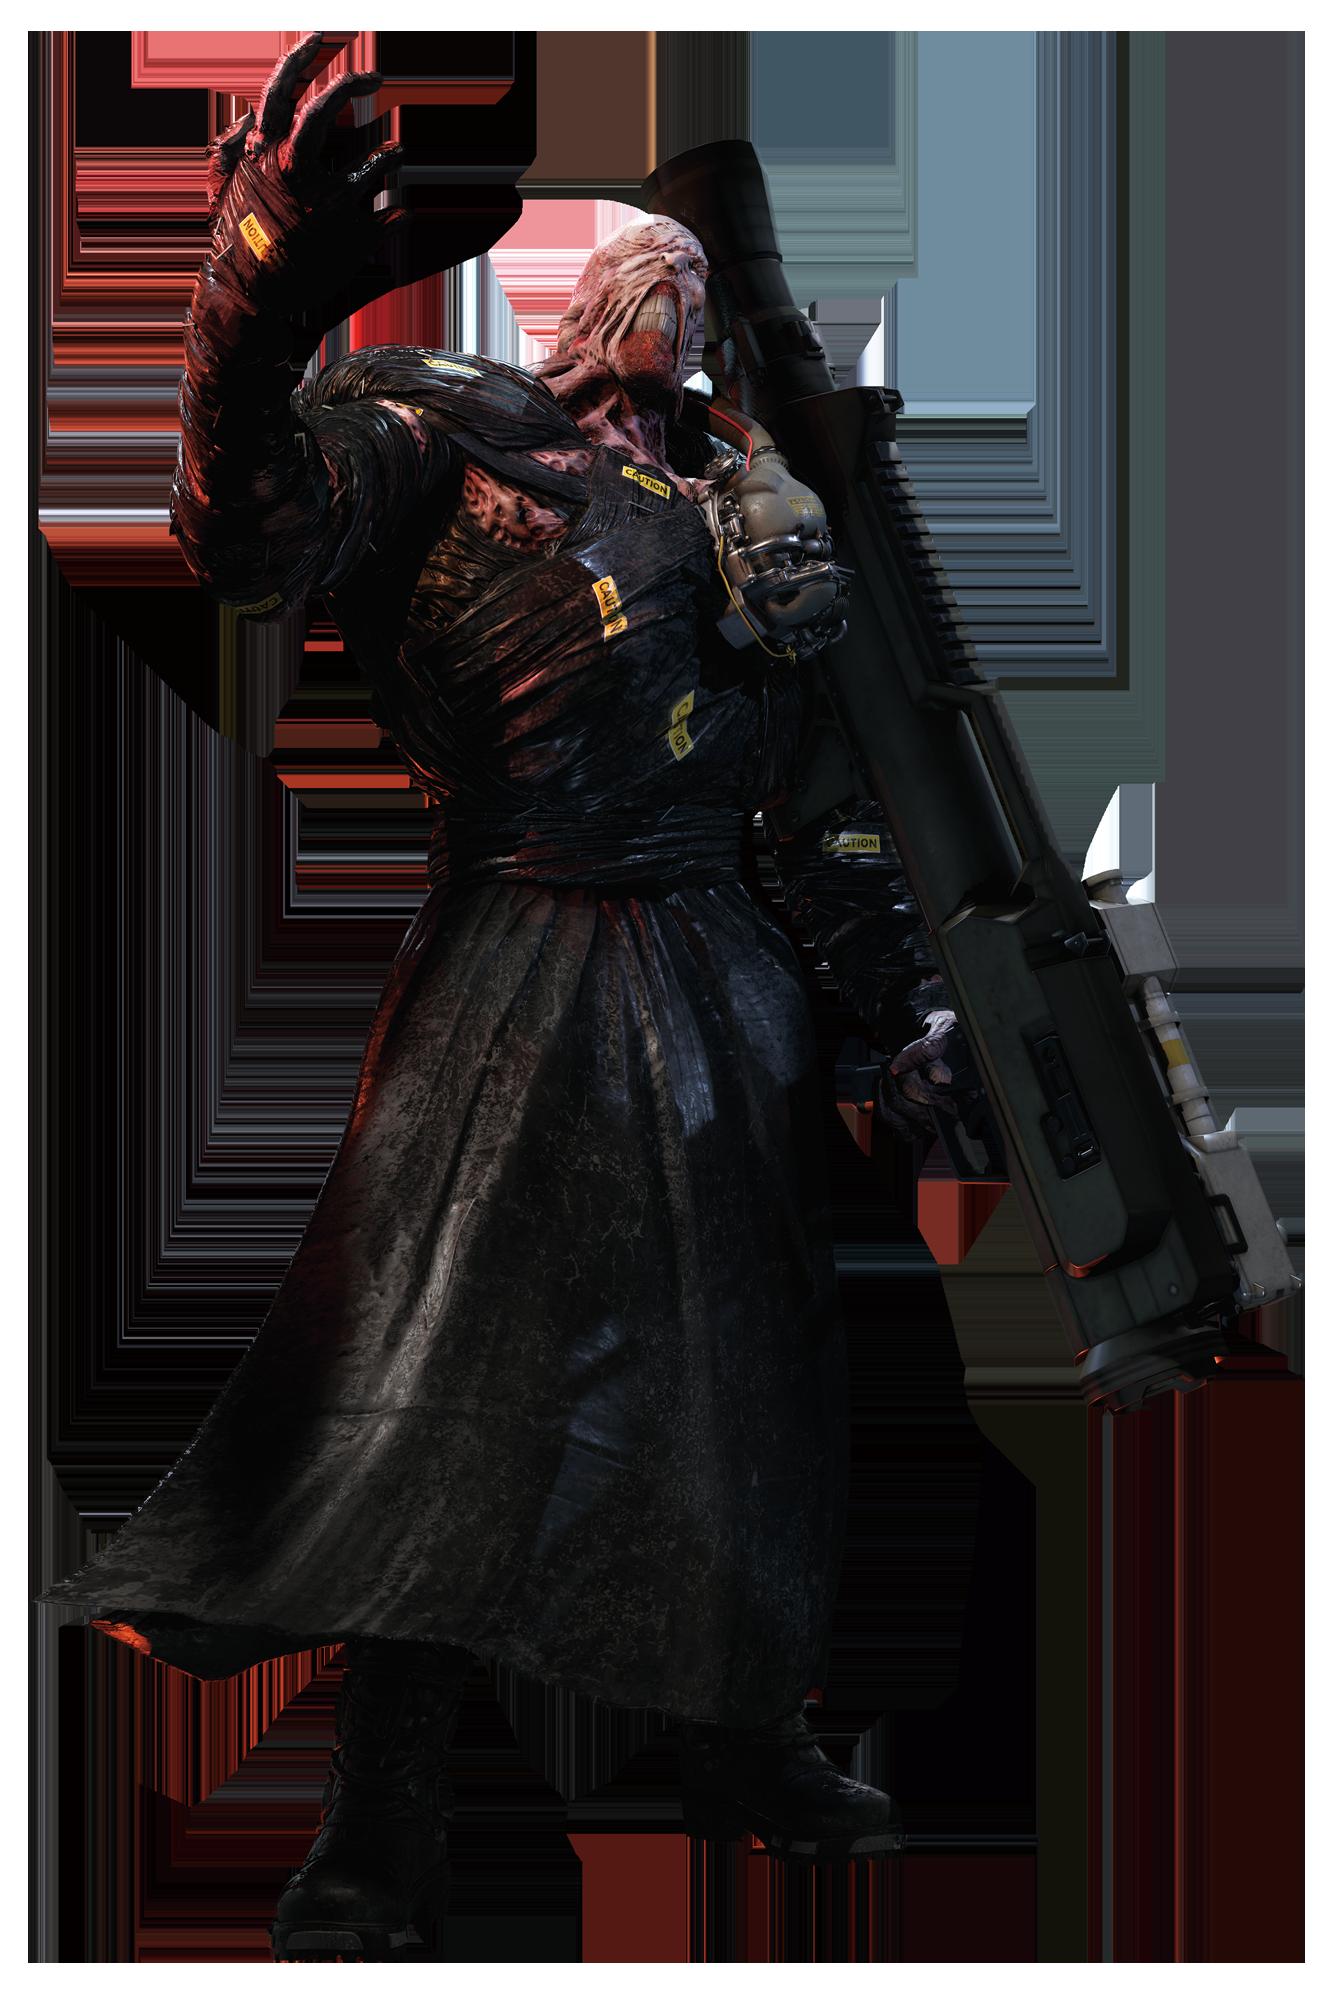 Resident Evil Resistance Nemesis Hq Png By Xgamergreaserx On Deviantart Resident Evil Monsters Resident Evil Resident Evil Nemesis